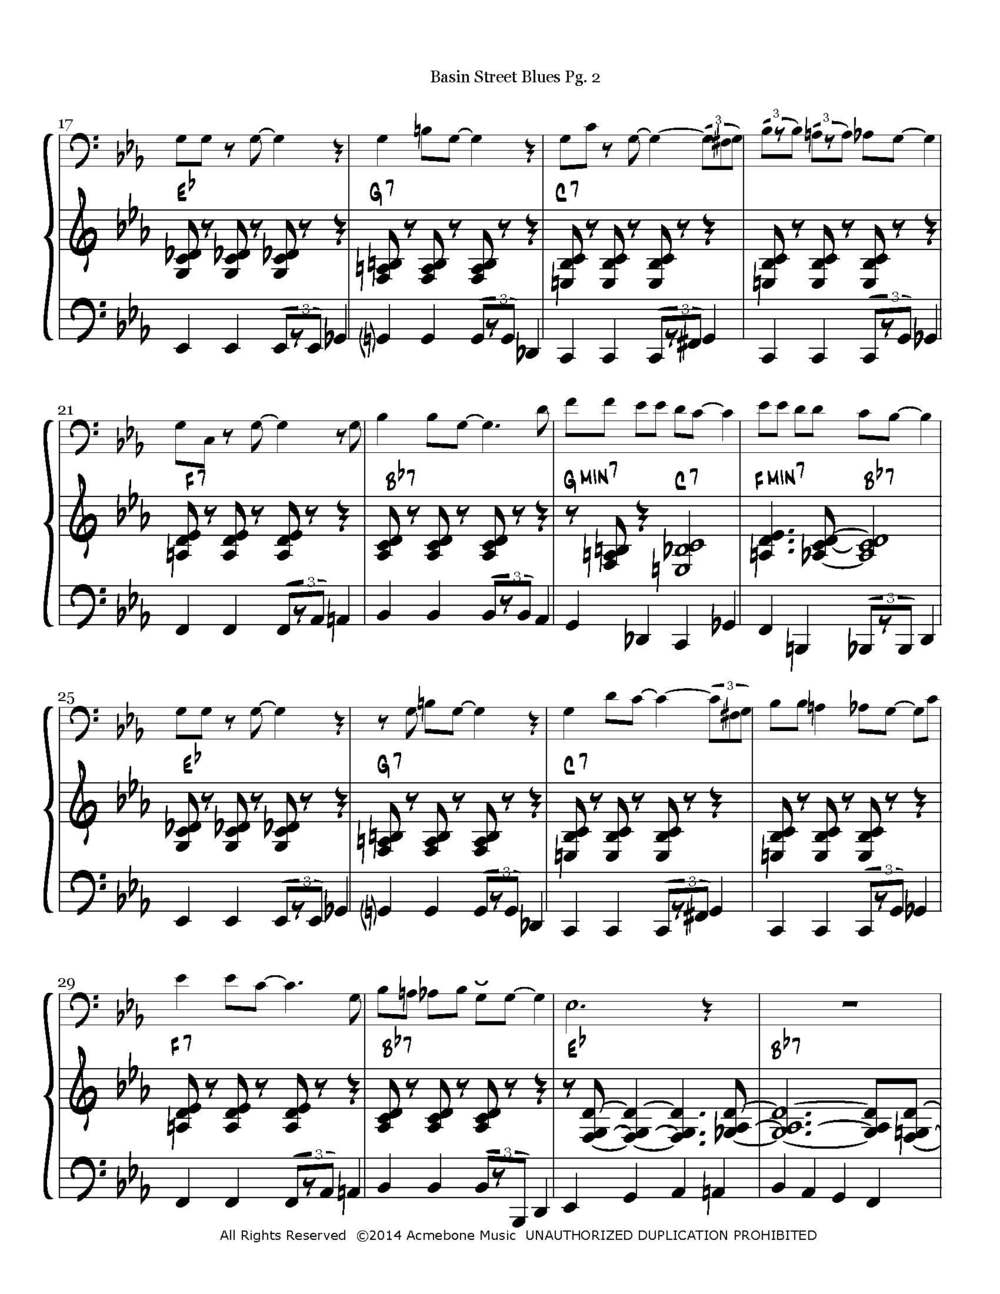 Basin Street Blues_download_from_acmebone.com_Page_5.jpg